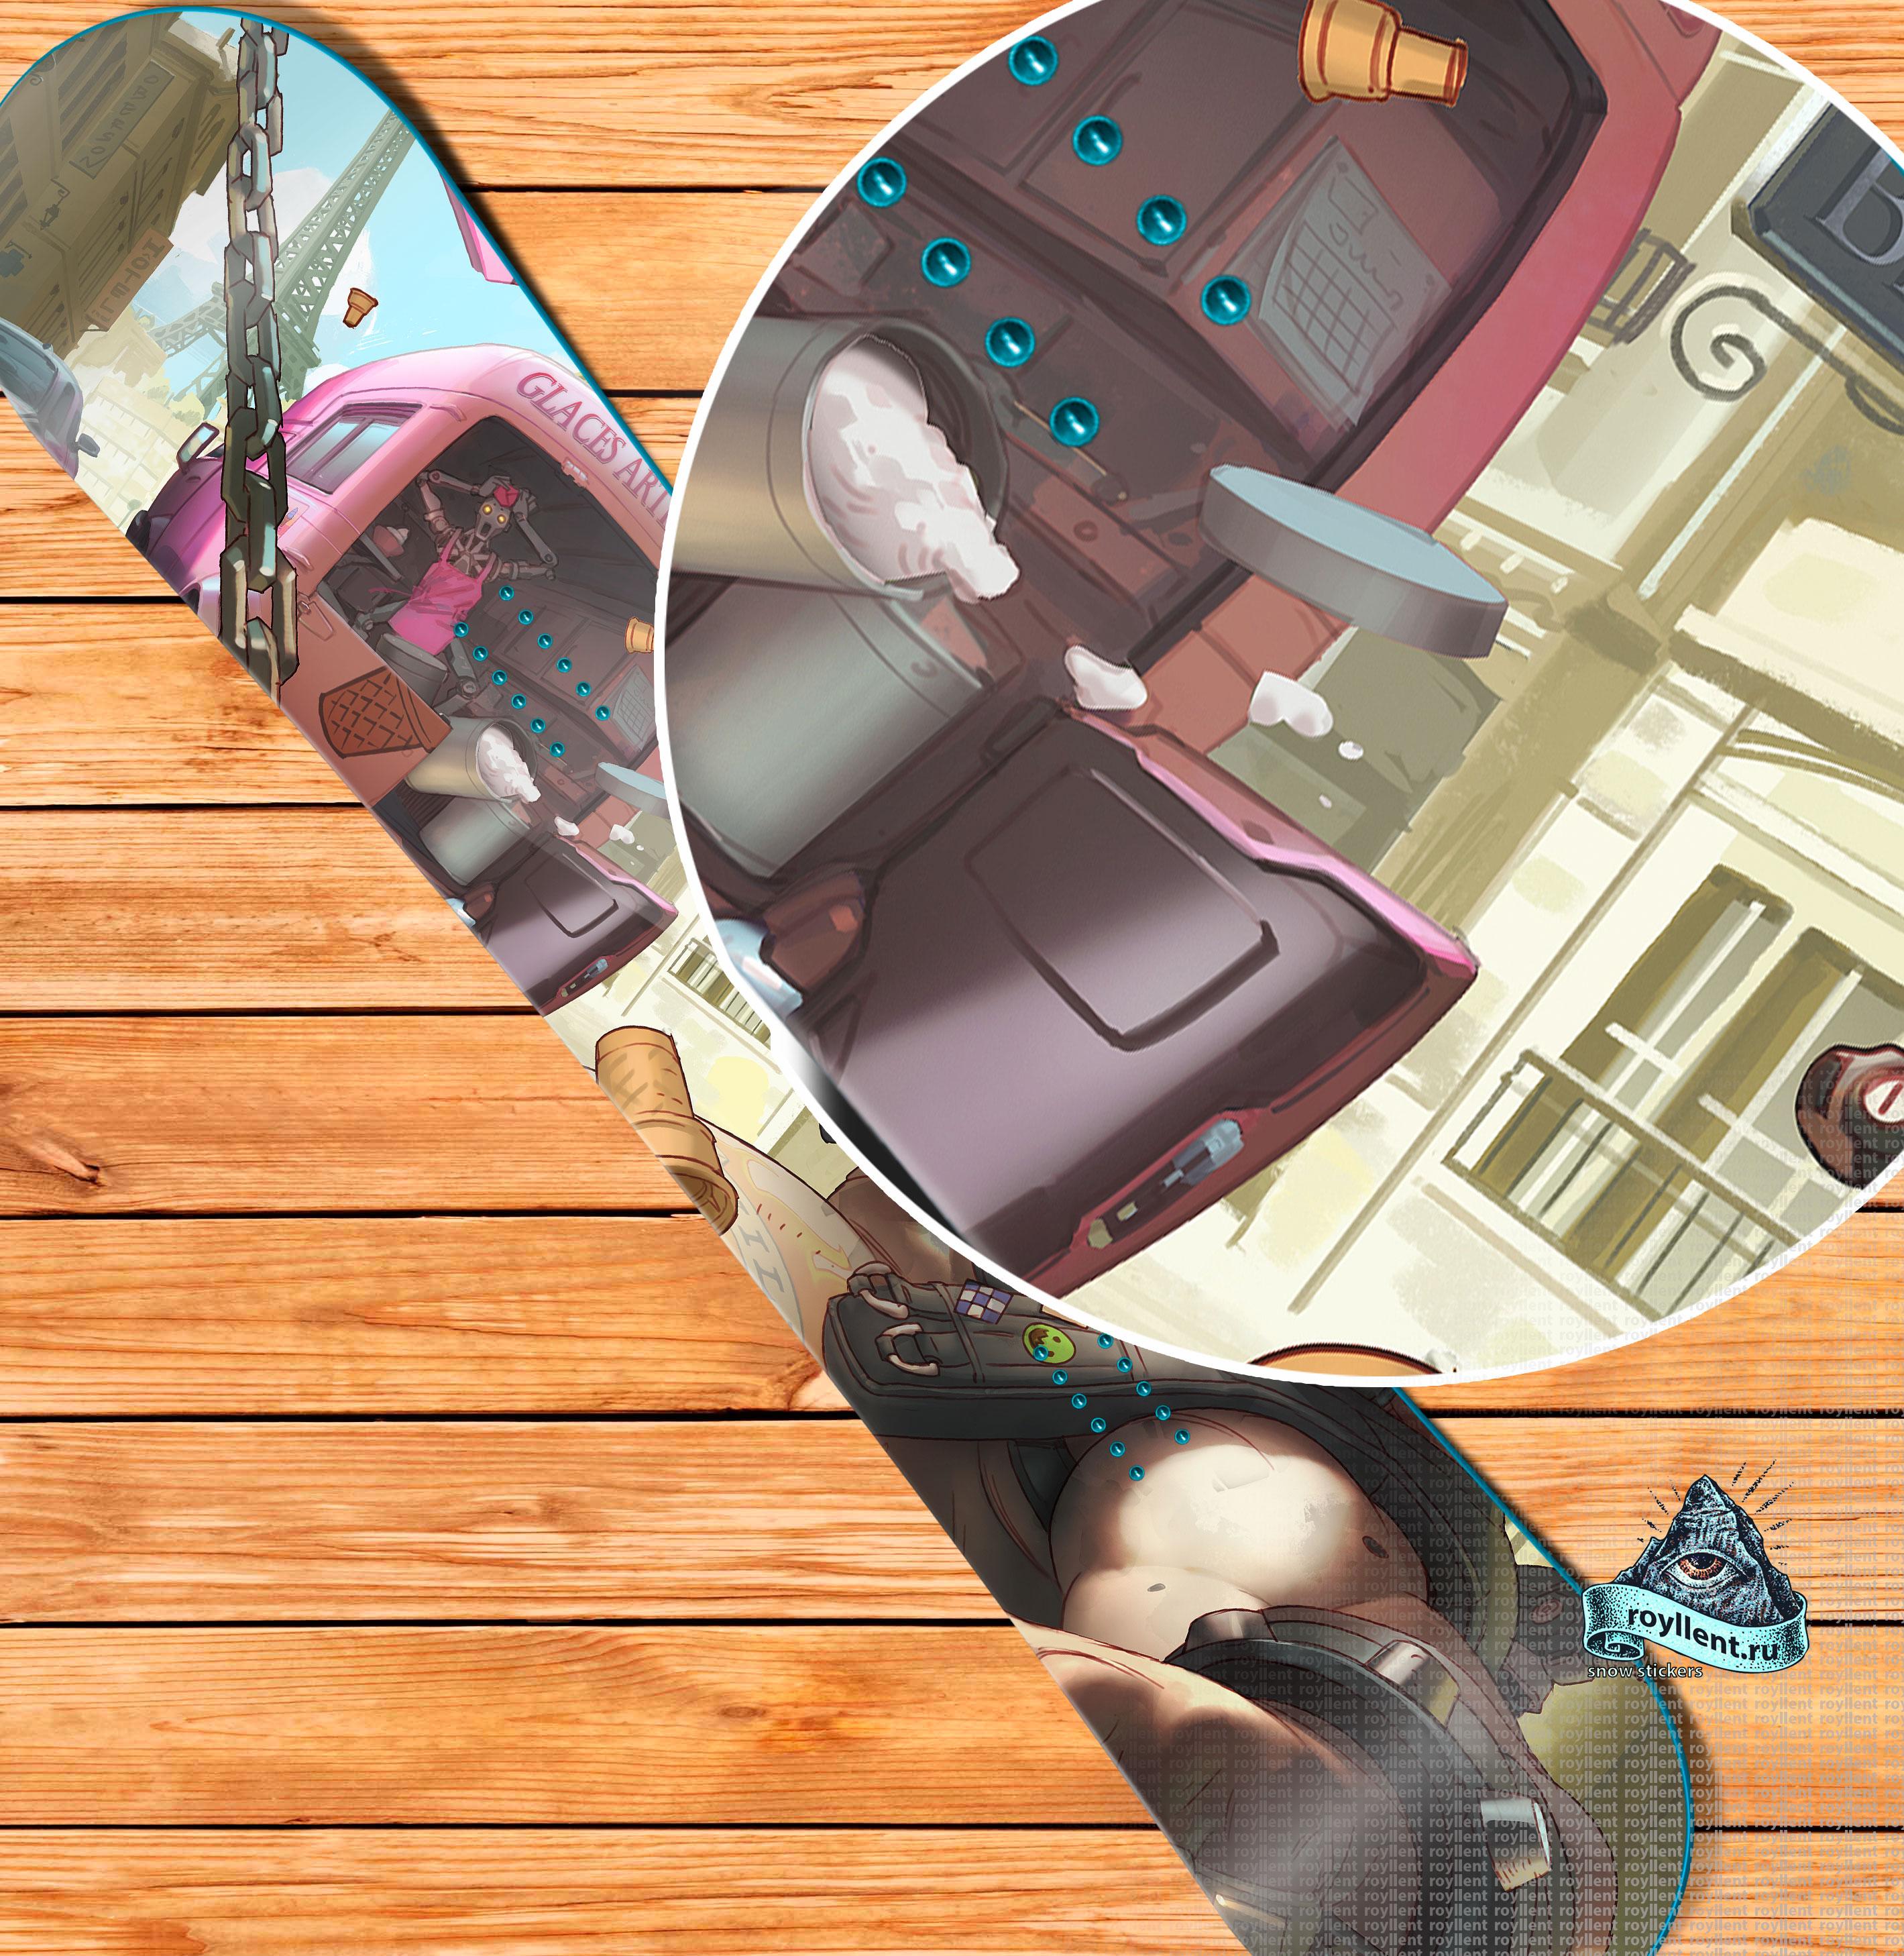 Наклейка Overwatch Junkers Paris , наклейка Overwatch Junkers Paris , наклейка на доску Overwatch Junkers Paris , сноуборд наклейка Overwatch Junkers Paris , виниловая наклейка Overwatch Junkers Paris , магазин наклеек Overwatch Junkers Paris , купить наклейку Overwatch Junkers Paris , стикер Overwatch Junkers Paris , sticker Overwatch Junkers Paris, наклейка, Полноразмерная наклейка на сноуборд, спб